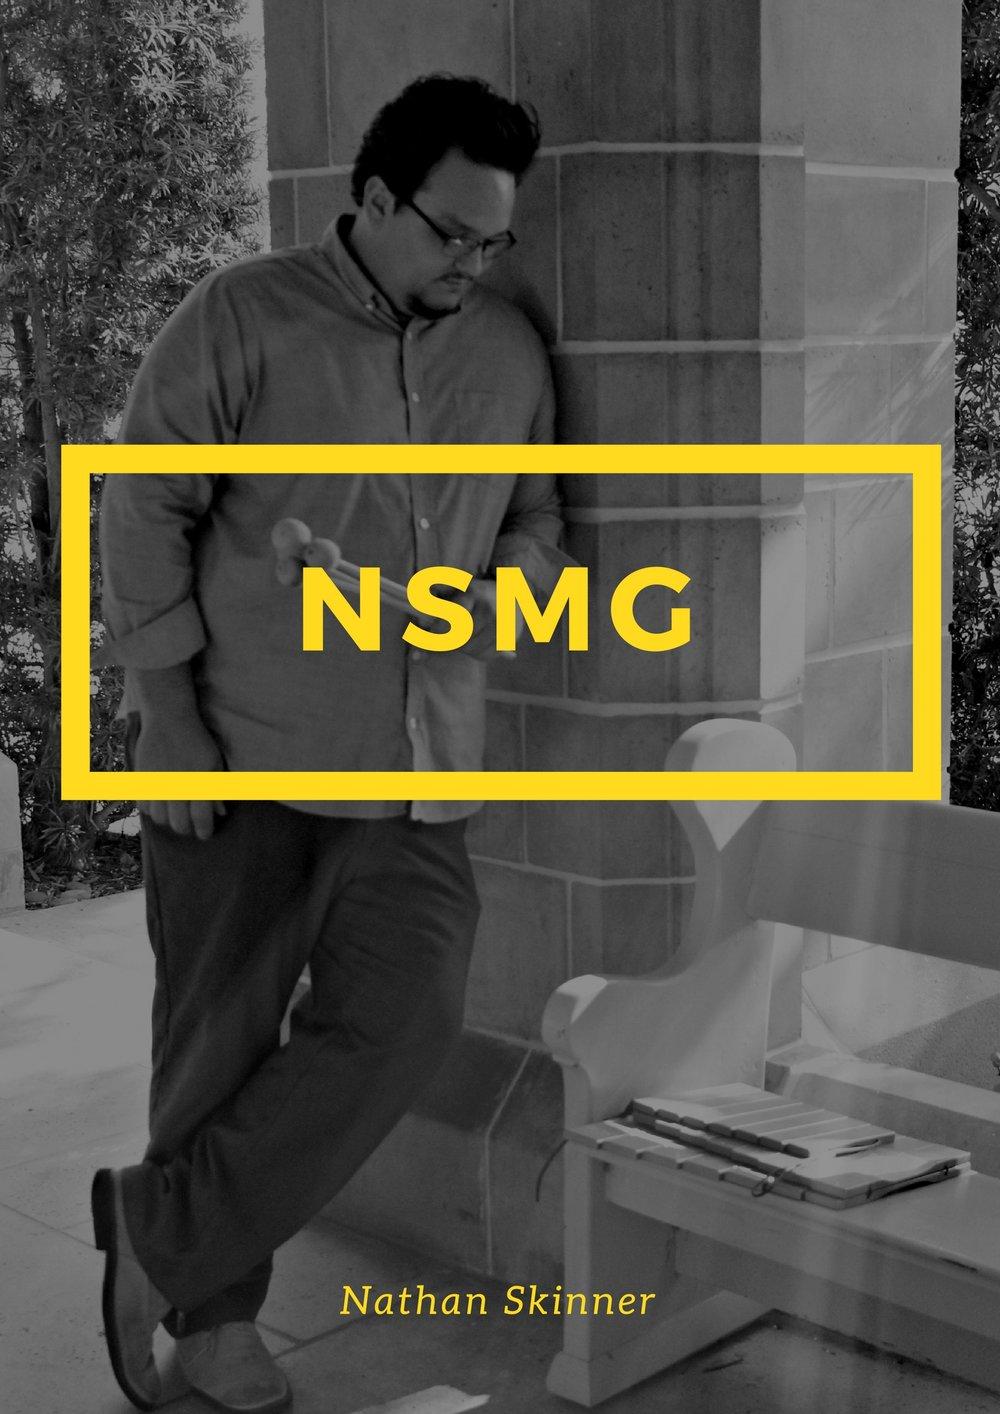 NSMG-4.jpg